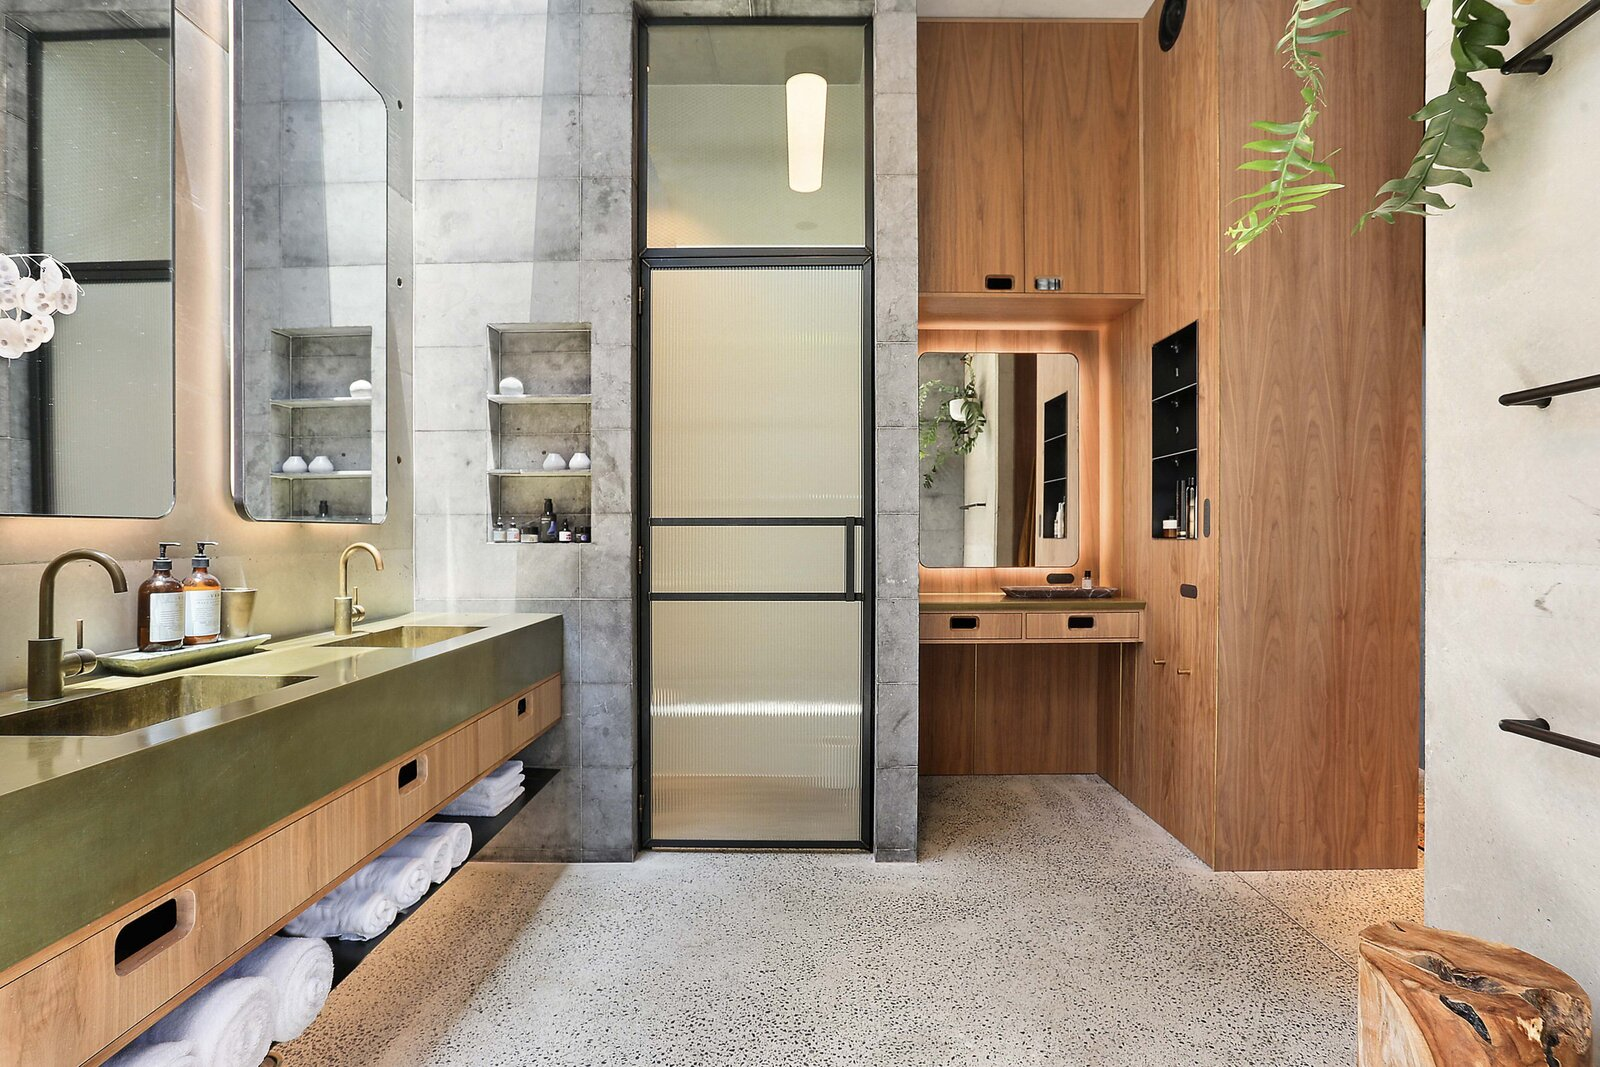 Sydney concrete home bathroom